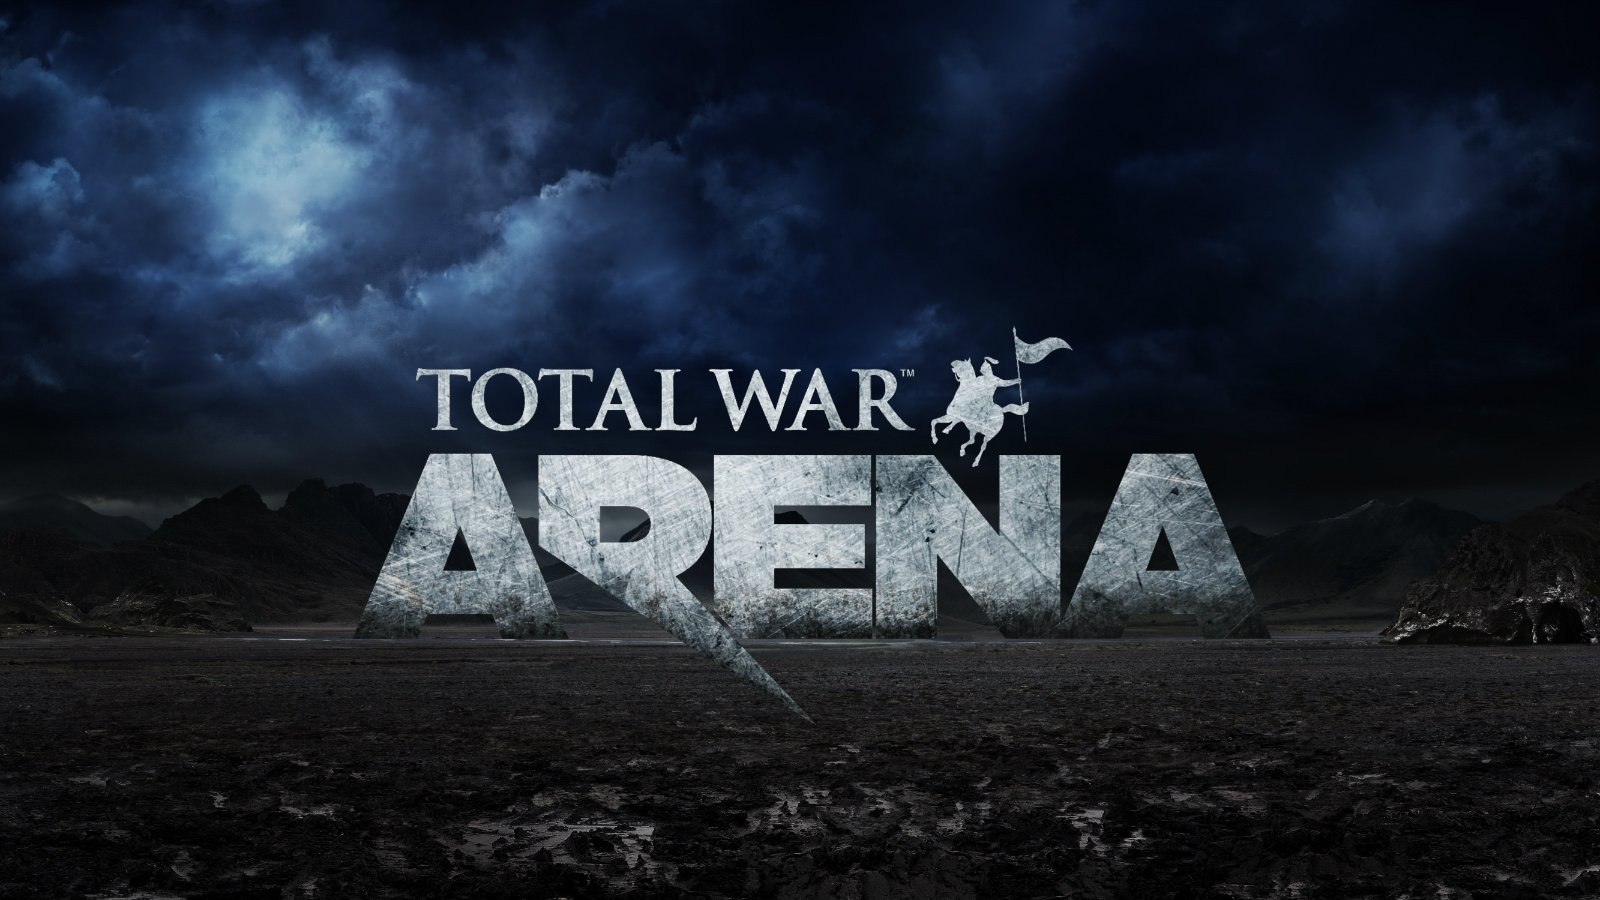 Total War: Arena, Free-to-Play игра от Creative Assembly.Во время своей сессии, на GDC 2013 в Сан-Франциско сегодня, .... - Изображение 1